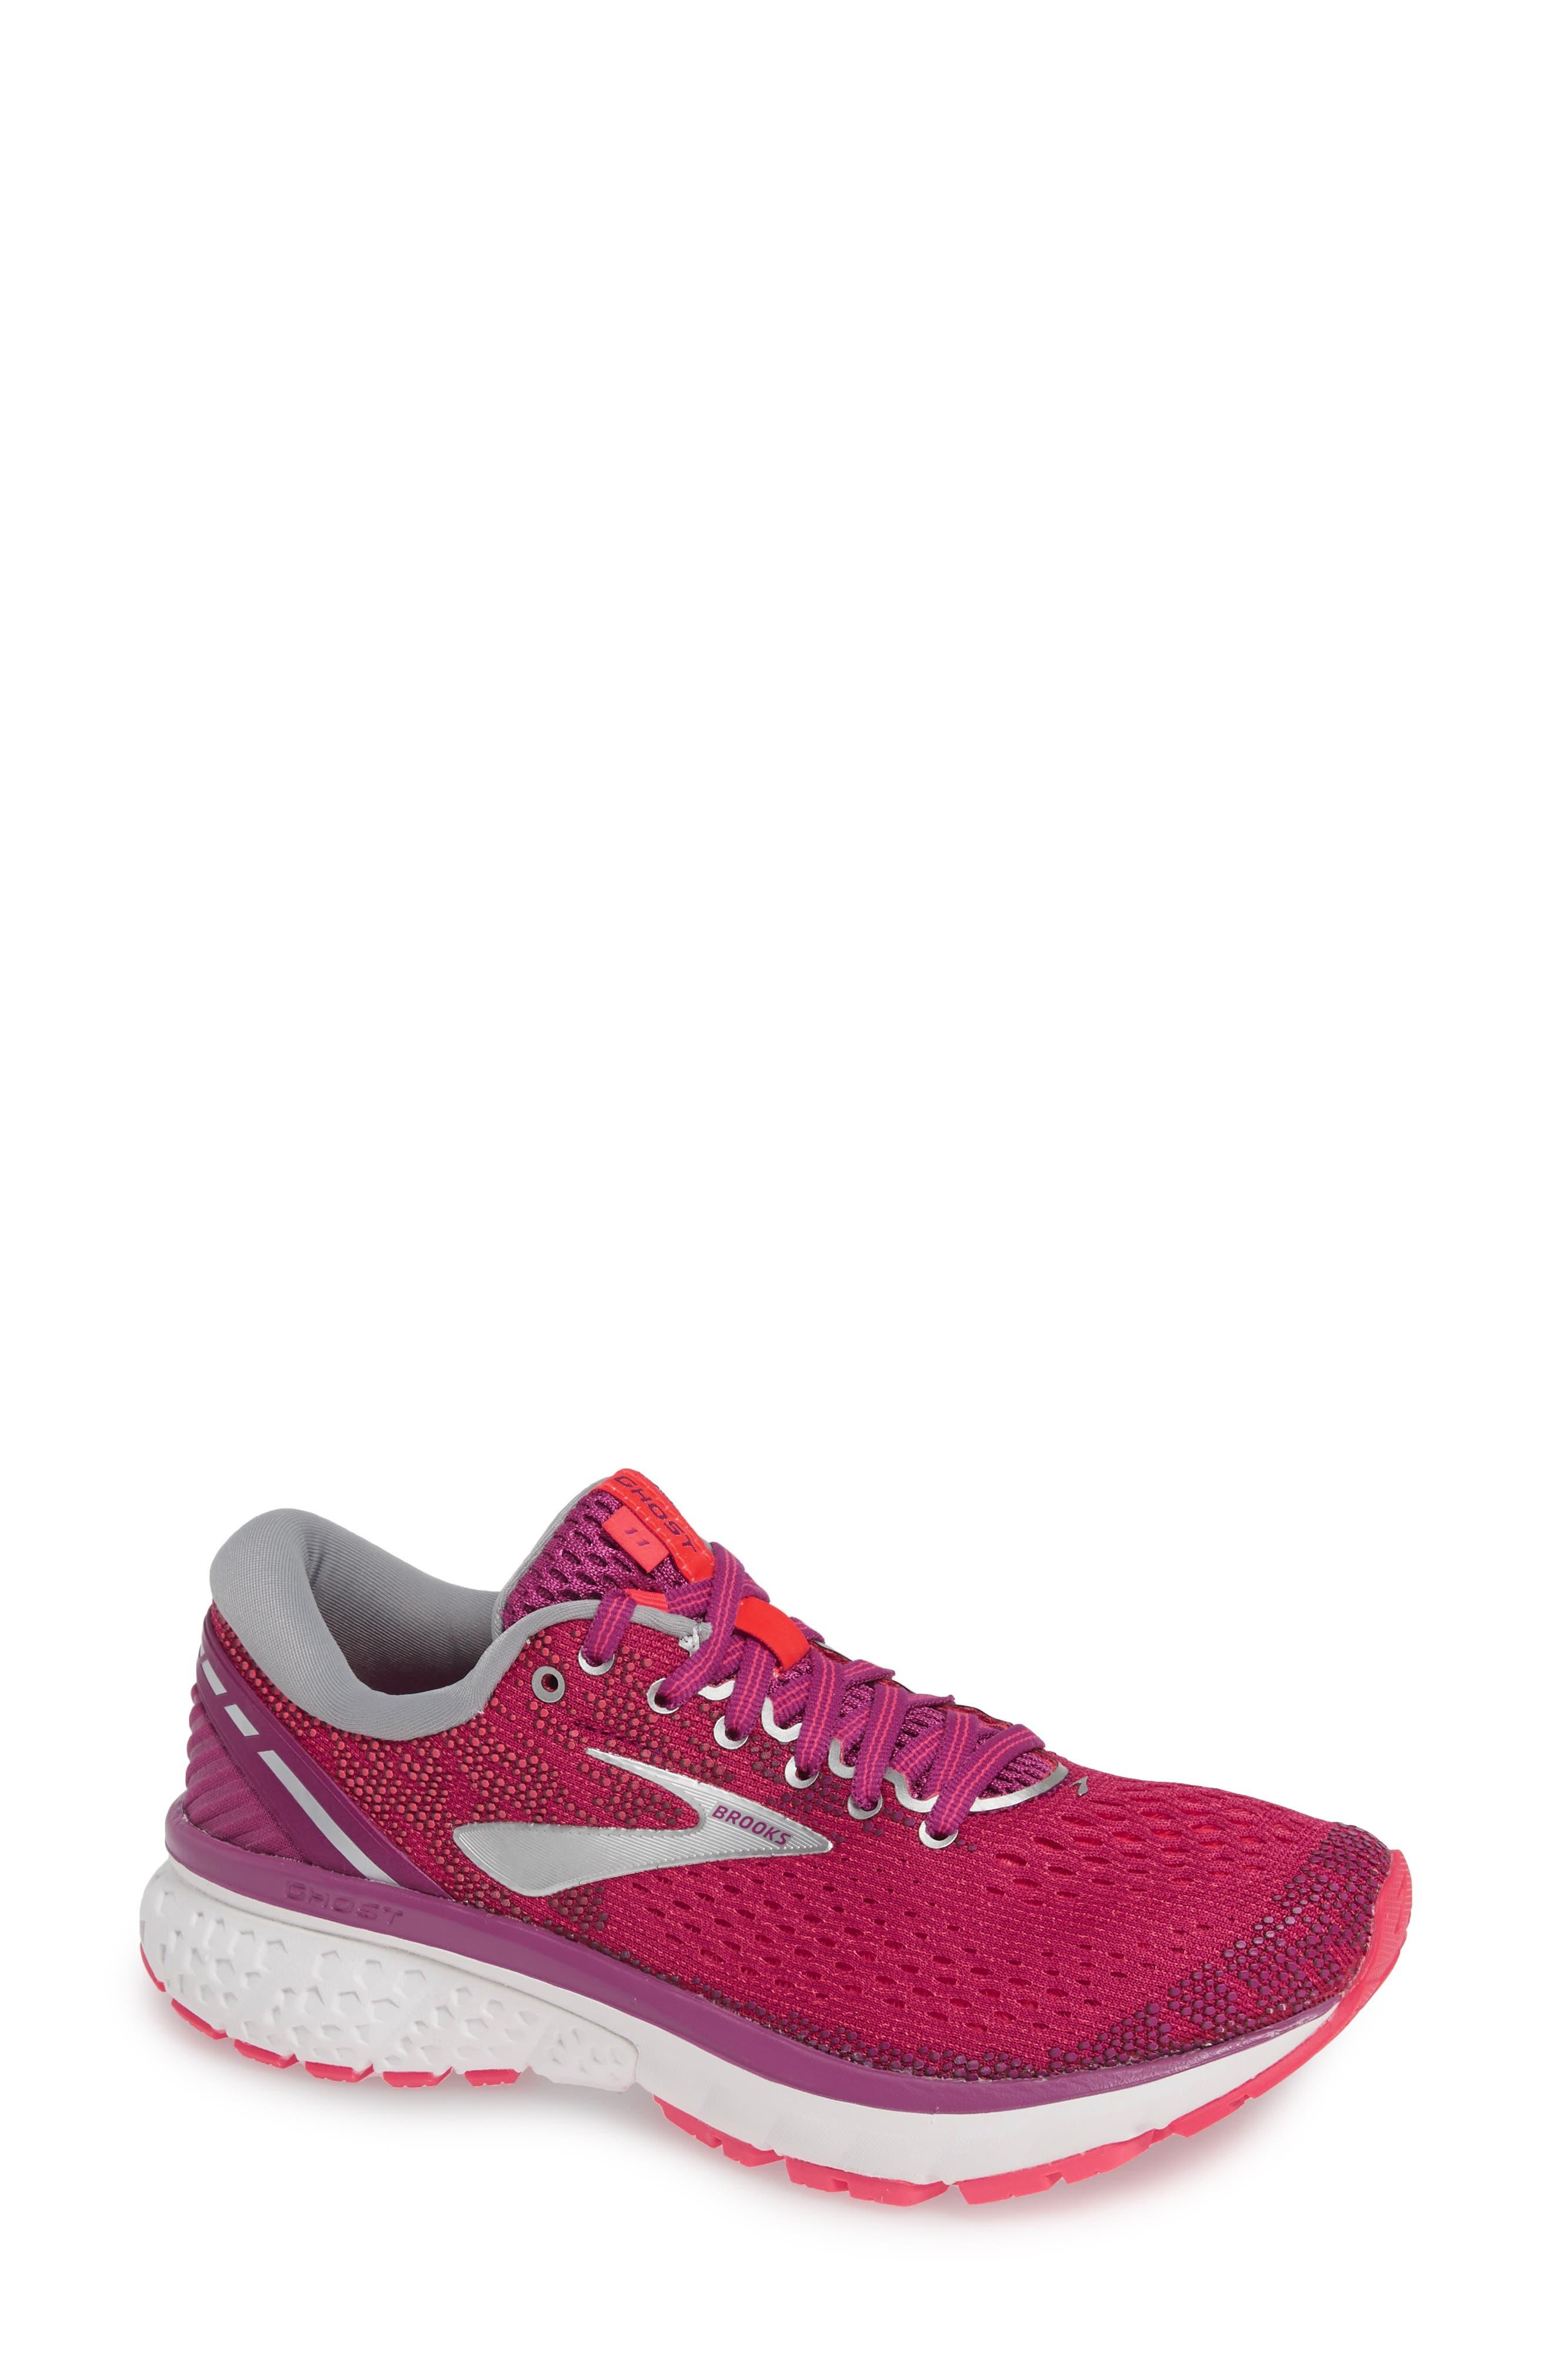 Brooks Ghost 11 Running Shoe, Pink